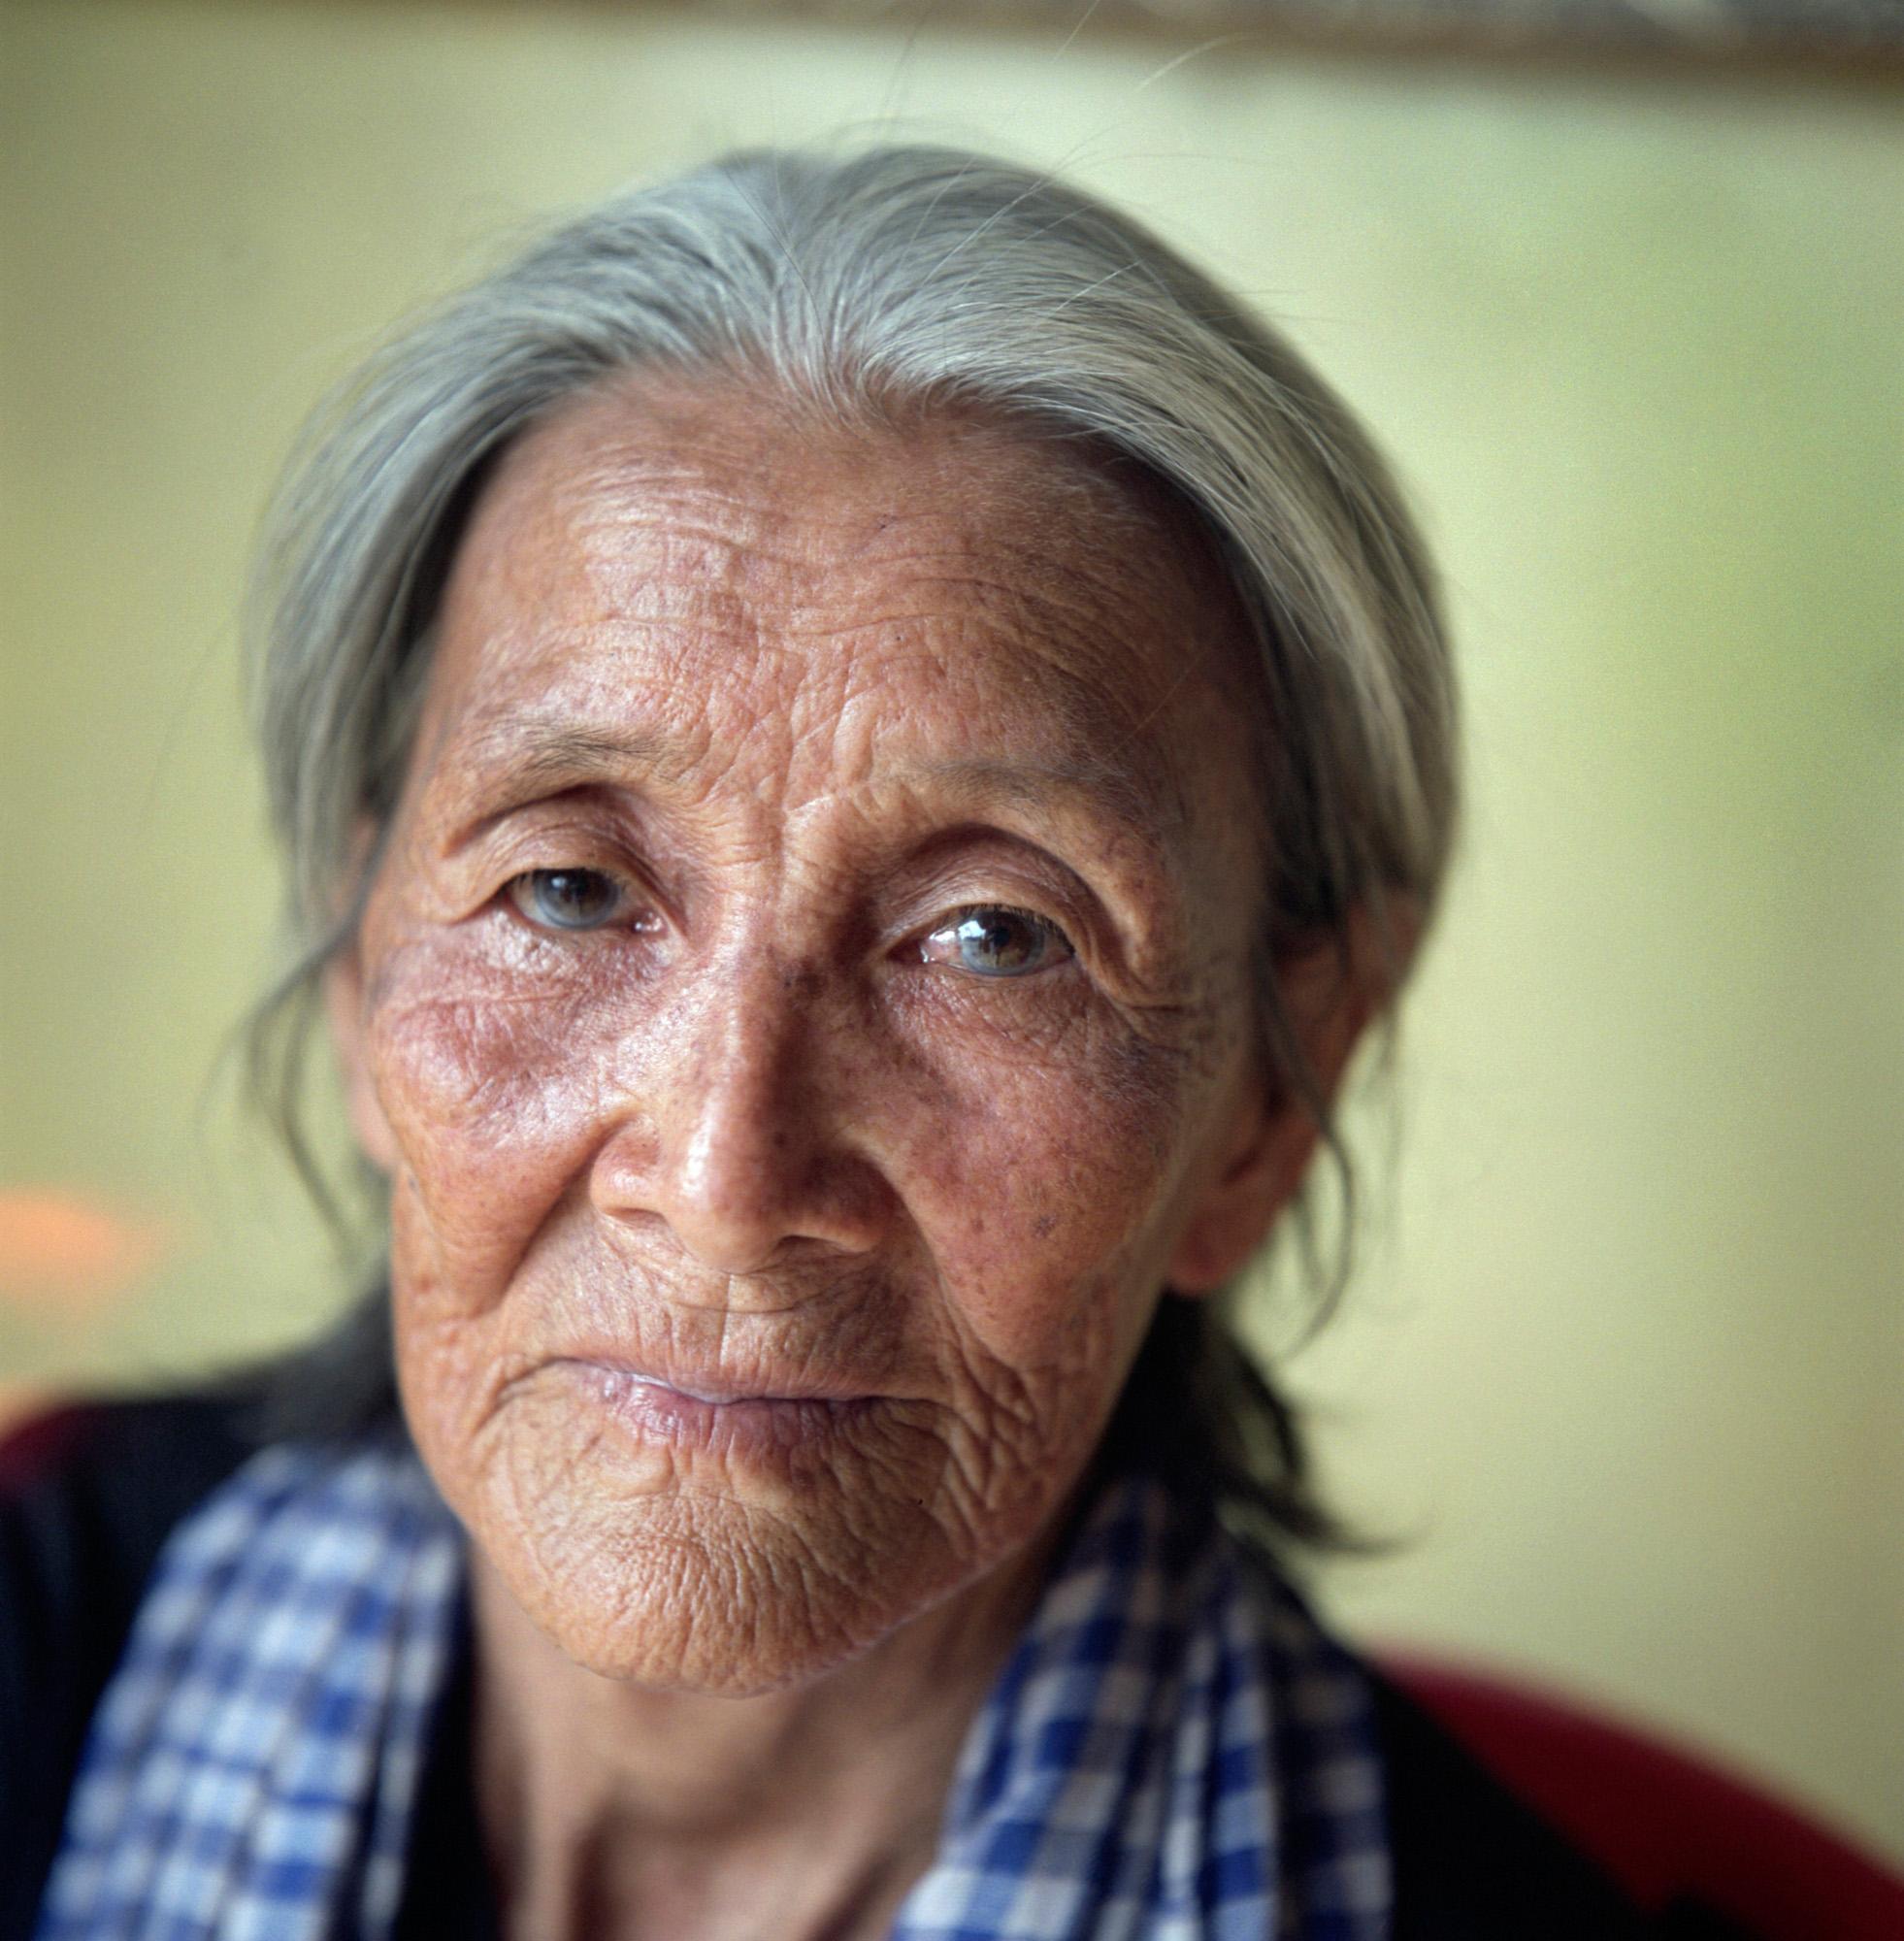 Portrait of Nget Khun, the eldest of the Boeung Kak women protestors.